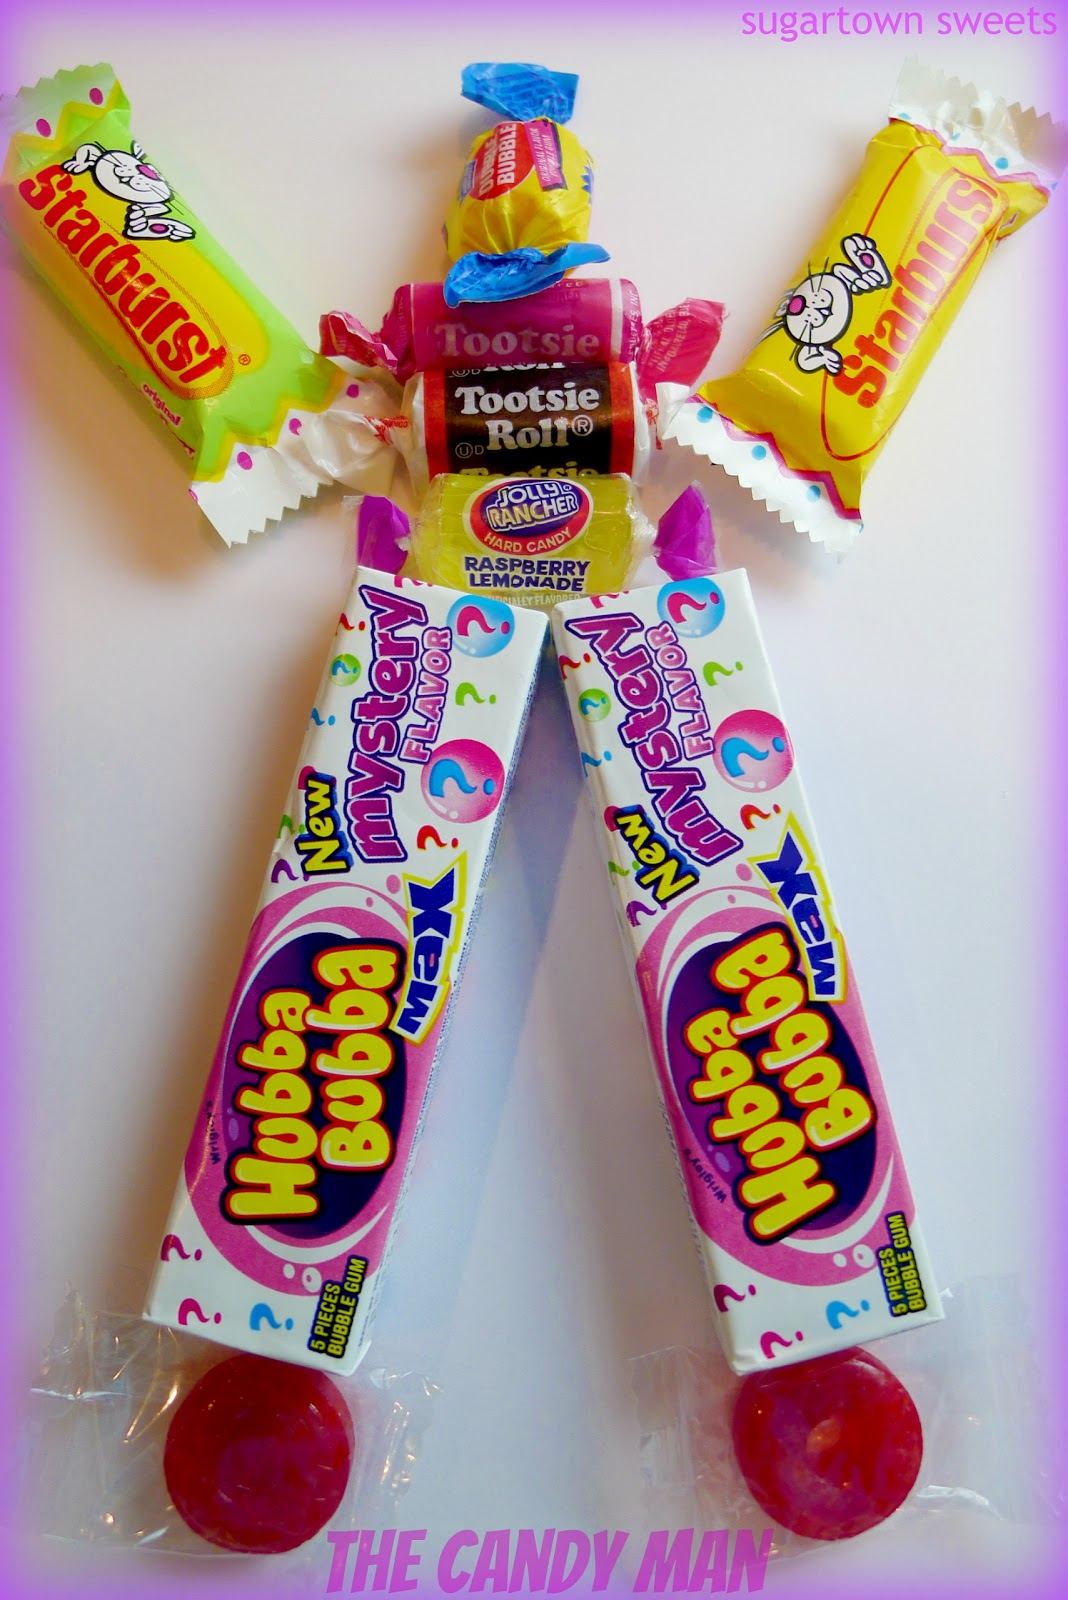 Sugartown Sweets Lifesavers Bubblegum Amp Tootsie Roll Pops